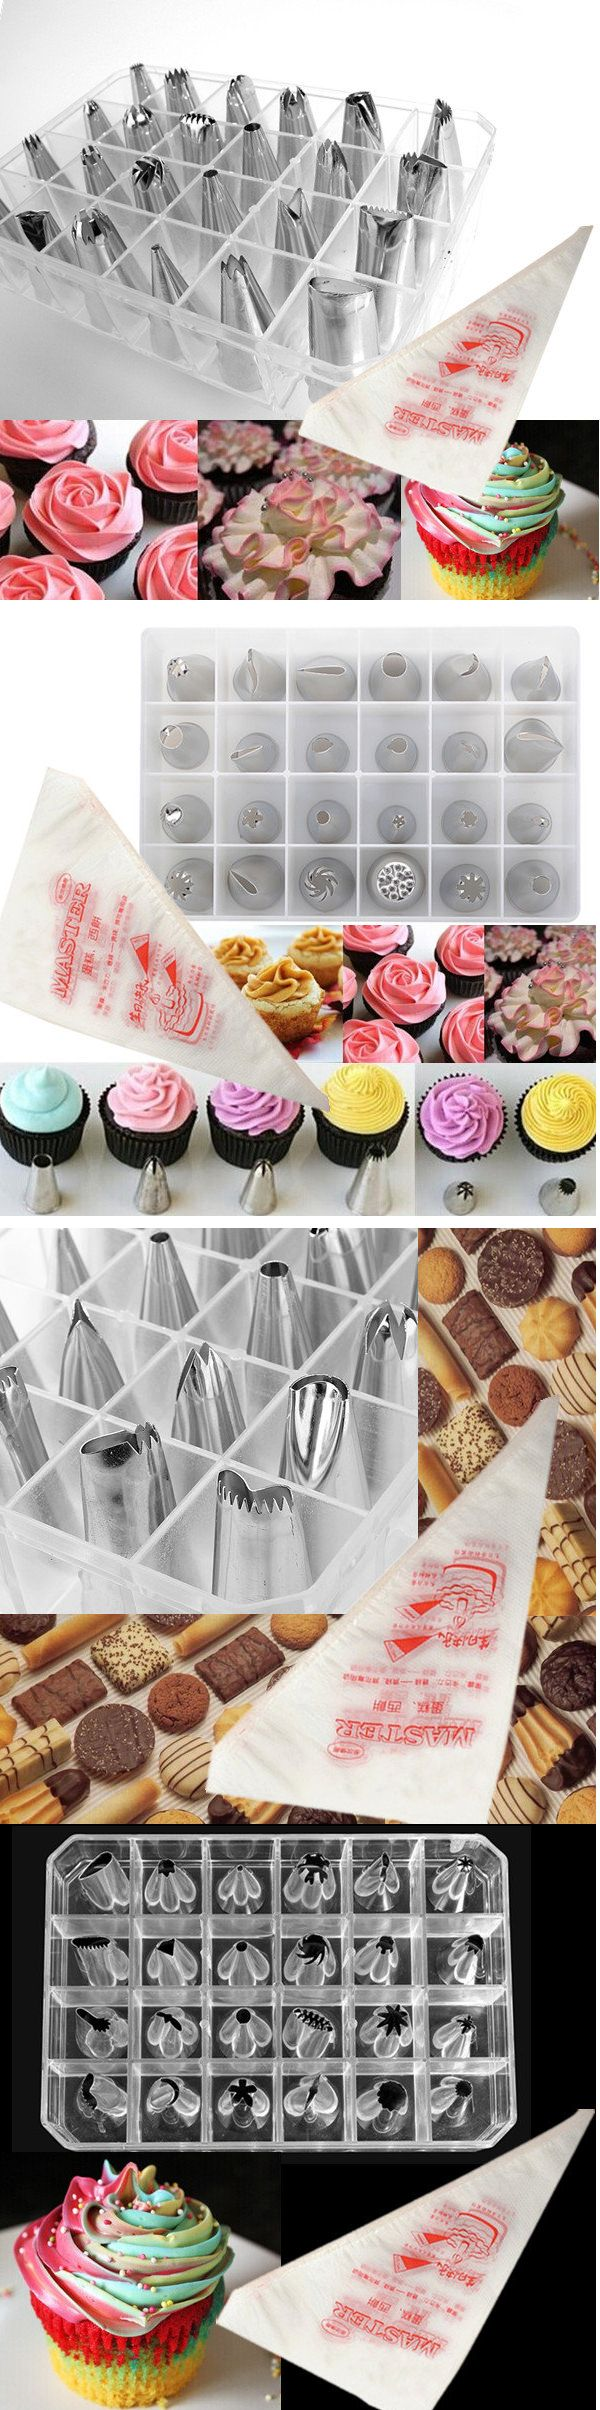 US$7.99 24pcs Cake Decoration Set Of Icing Piping Nozzle Tips Set